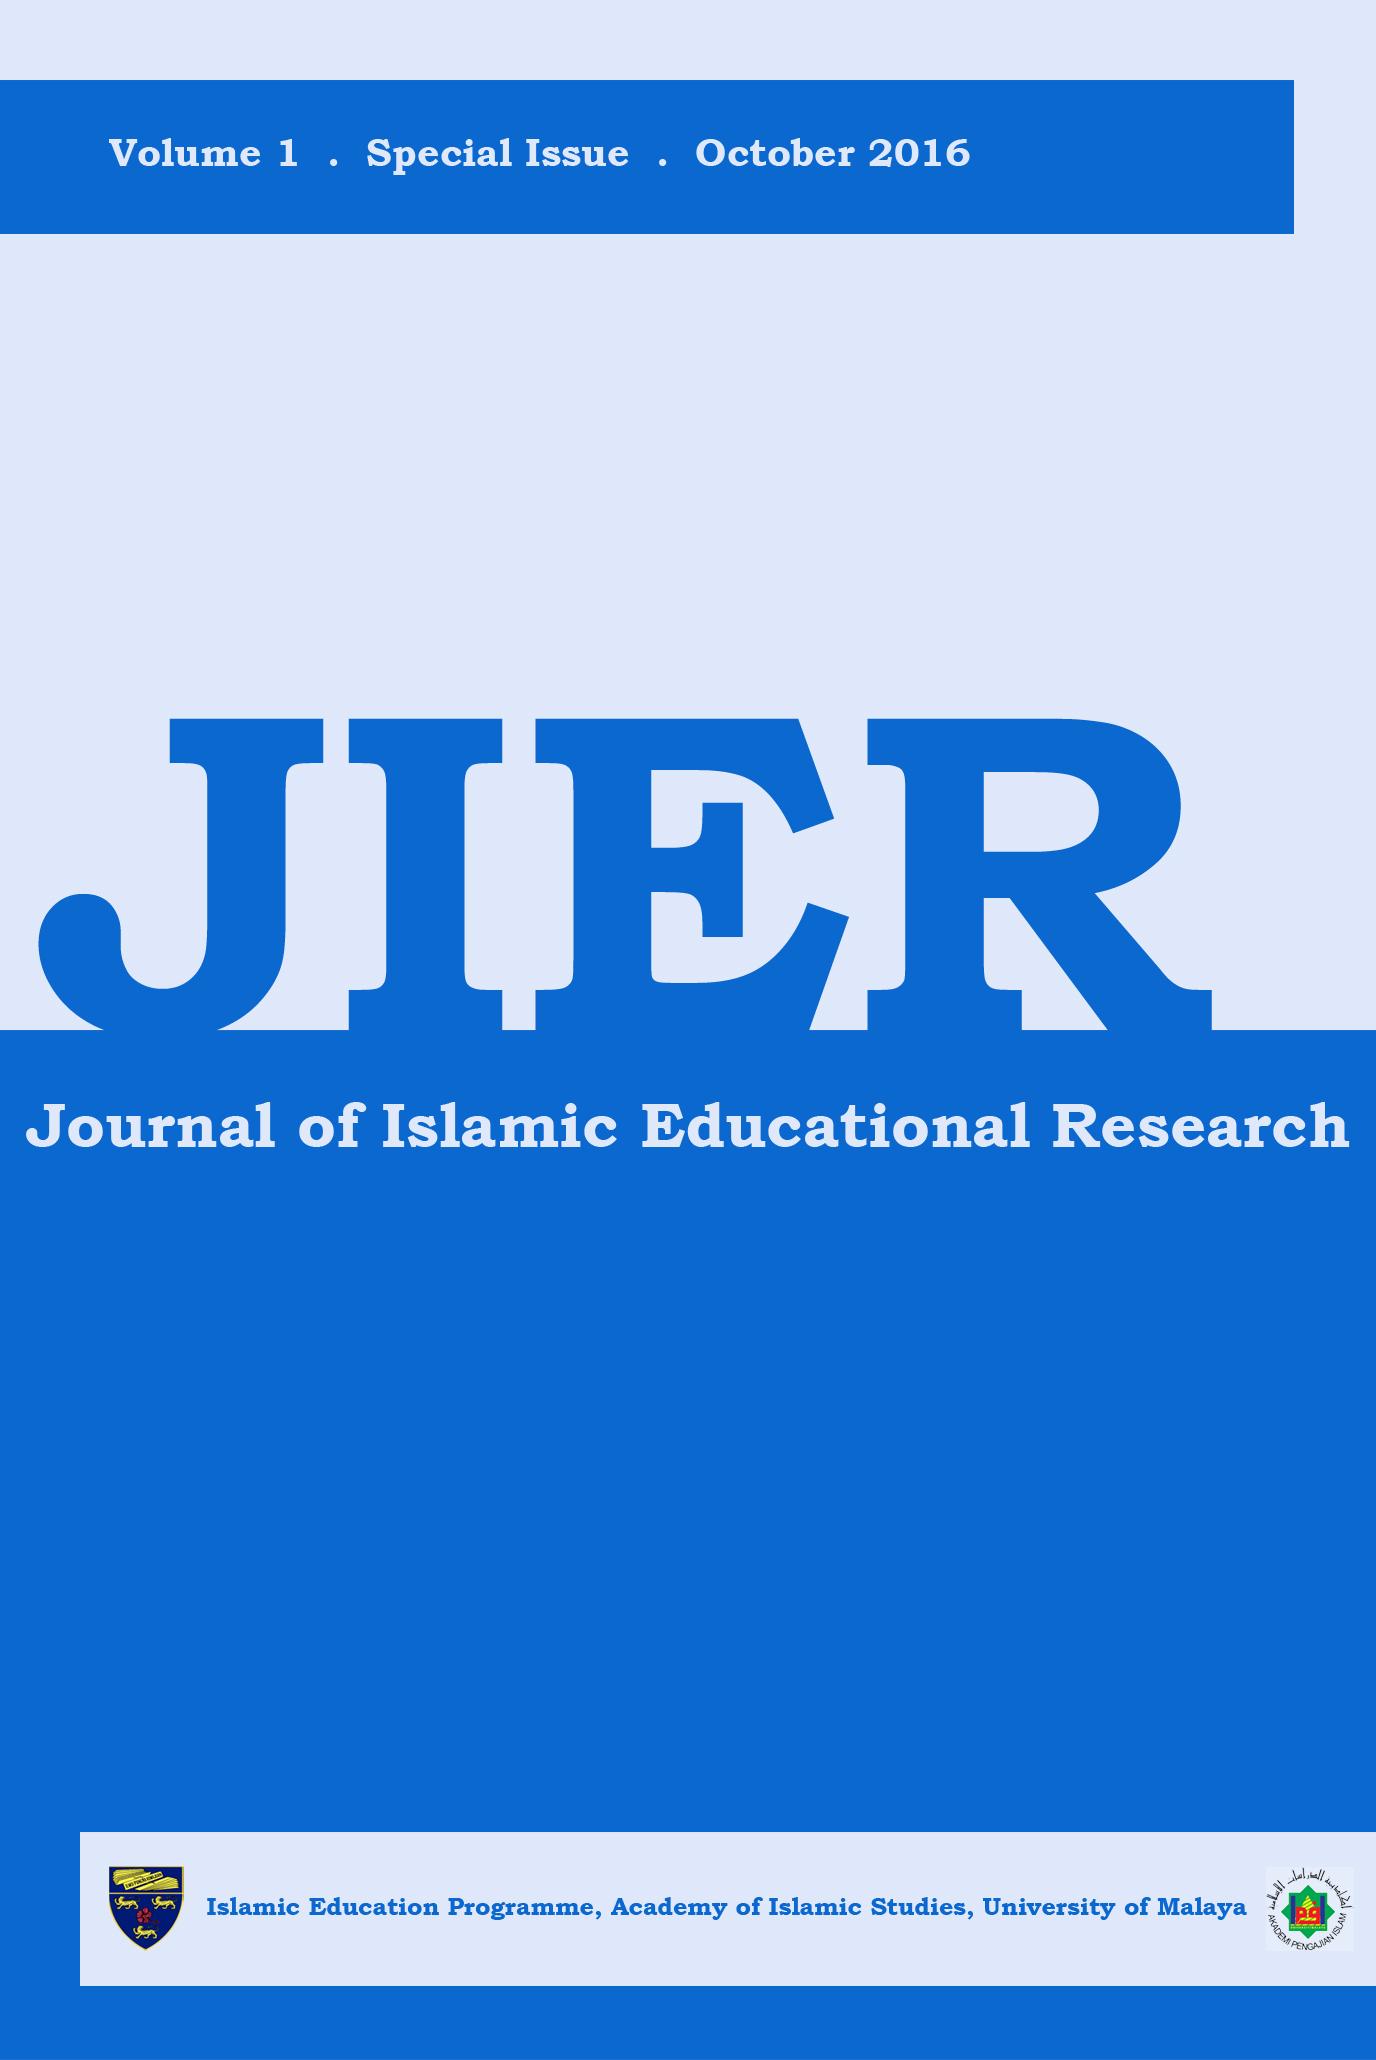 Journal of Islamic Educational Research (JIER)